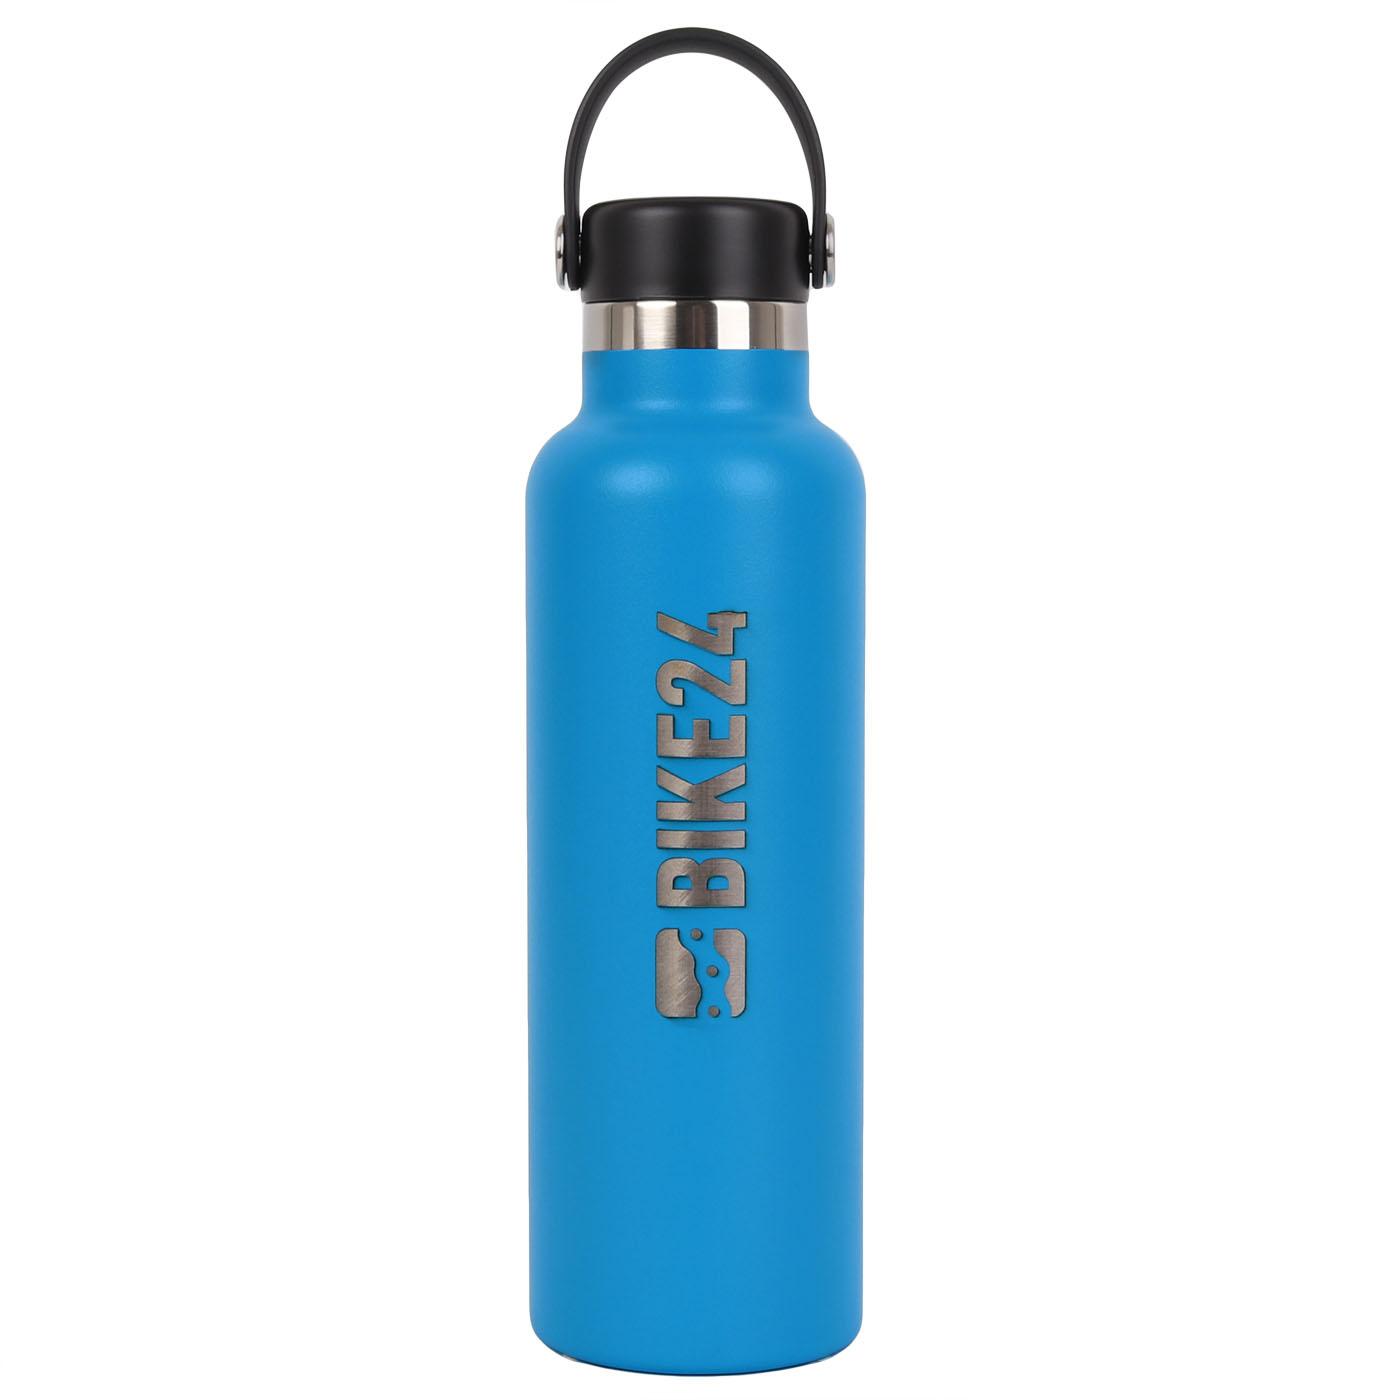 Hydro Flask BIKE24 Standard Mouth Flex Cap Thermoflasche 621ml - Pacific